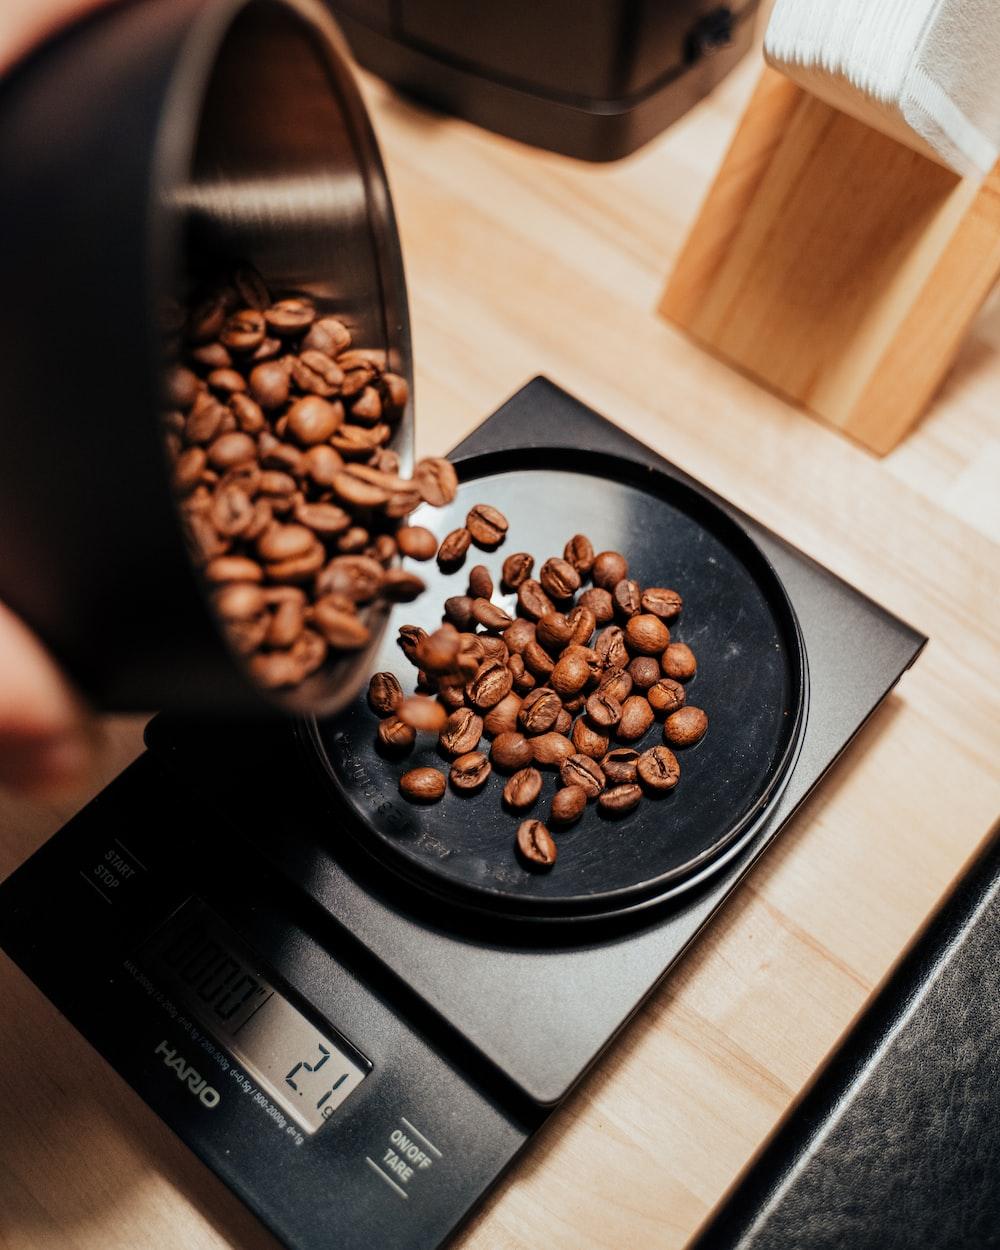 brown coffee beans on black ceramic mug